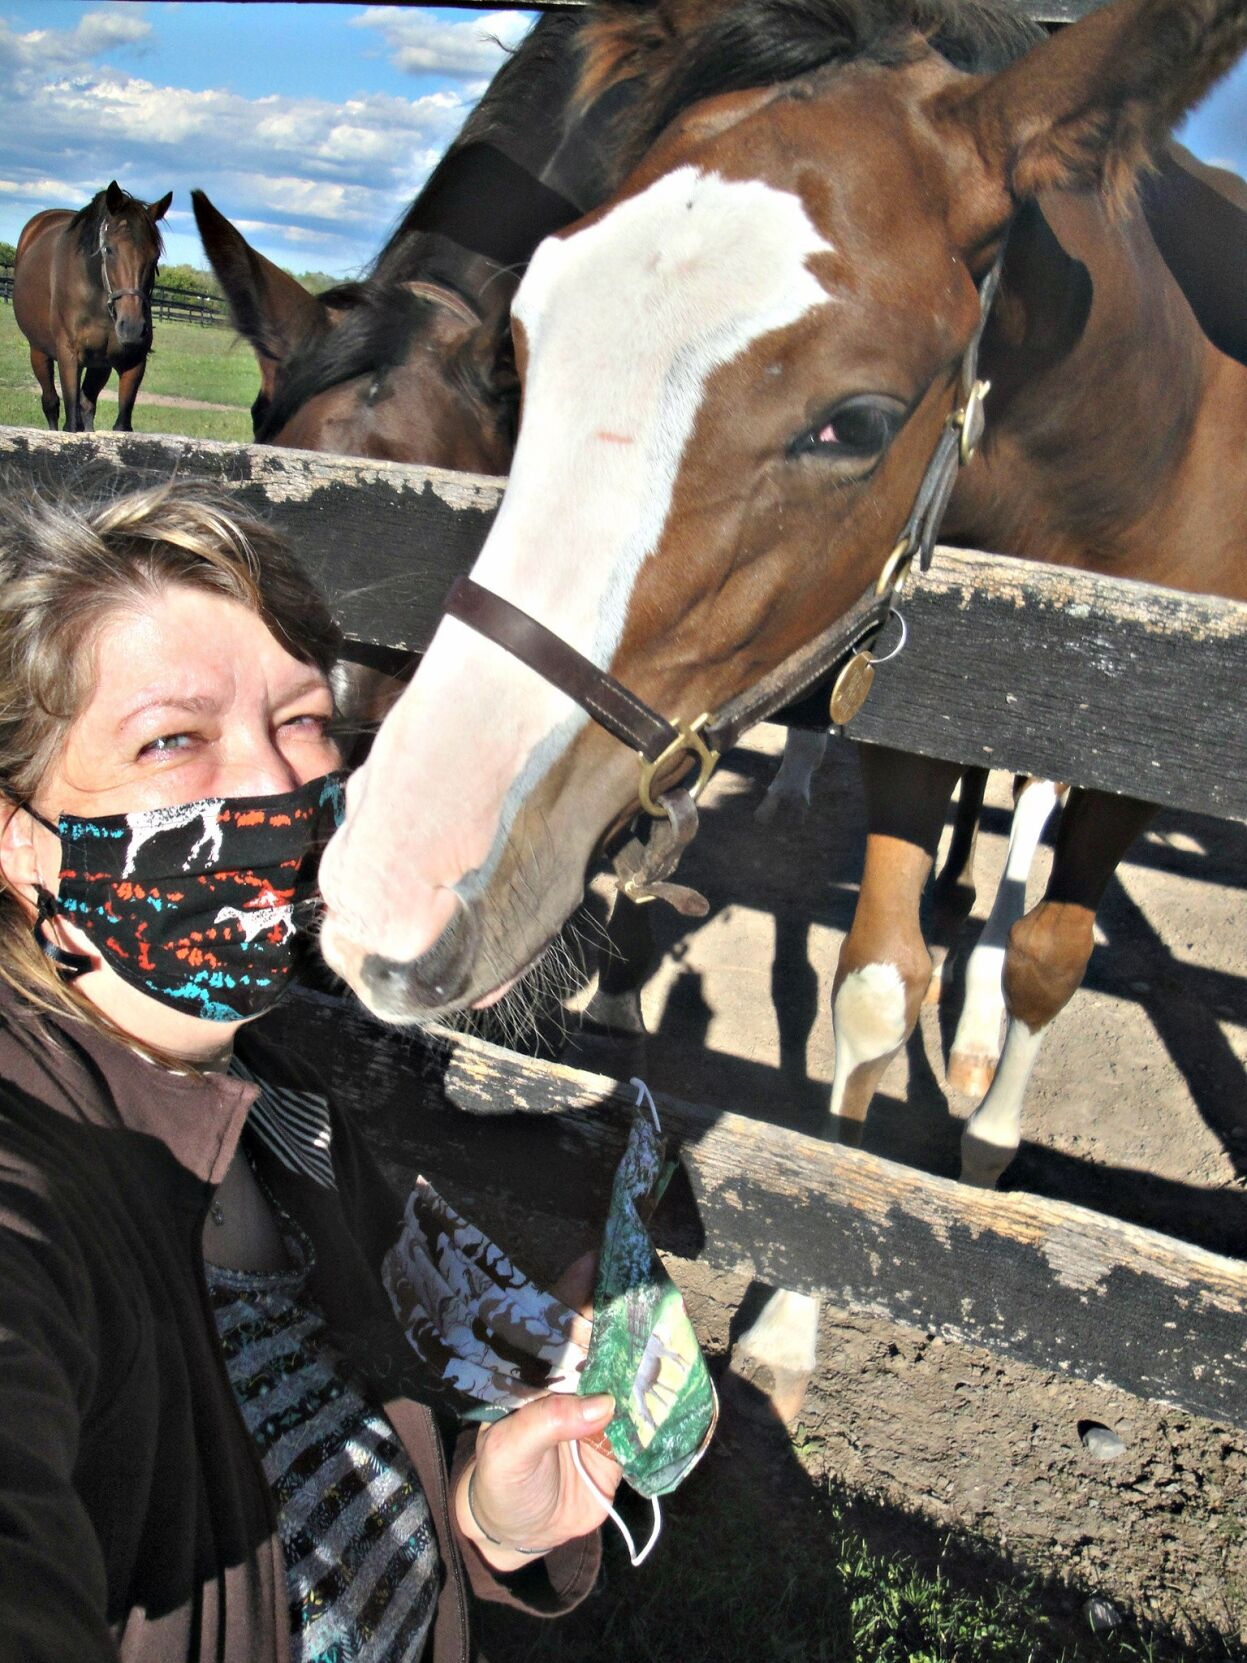 Elizabeth Hendy Masks a five-month-old thoroughbred